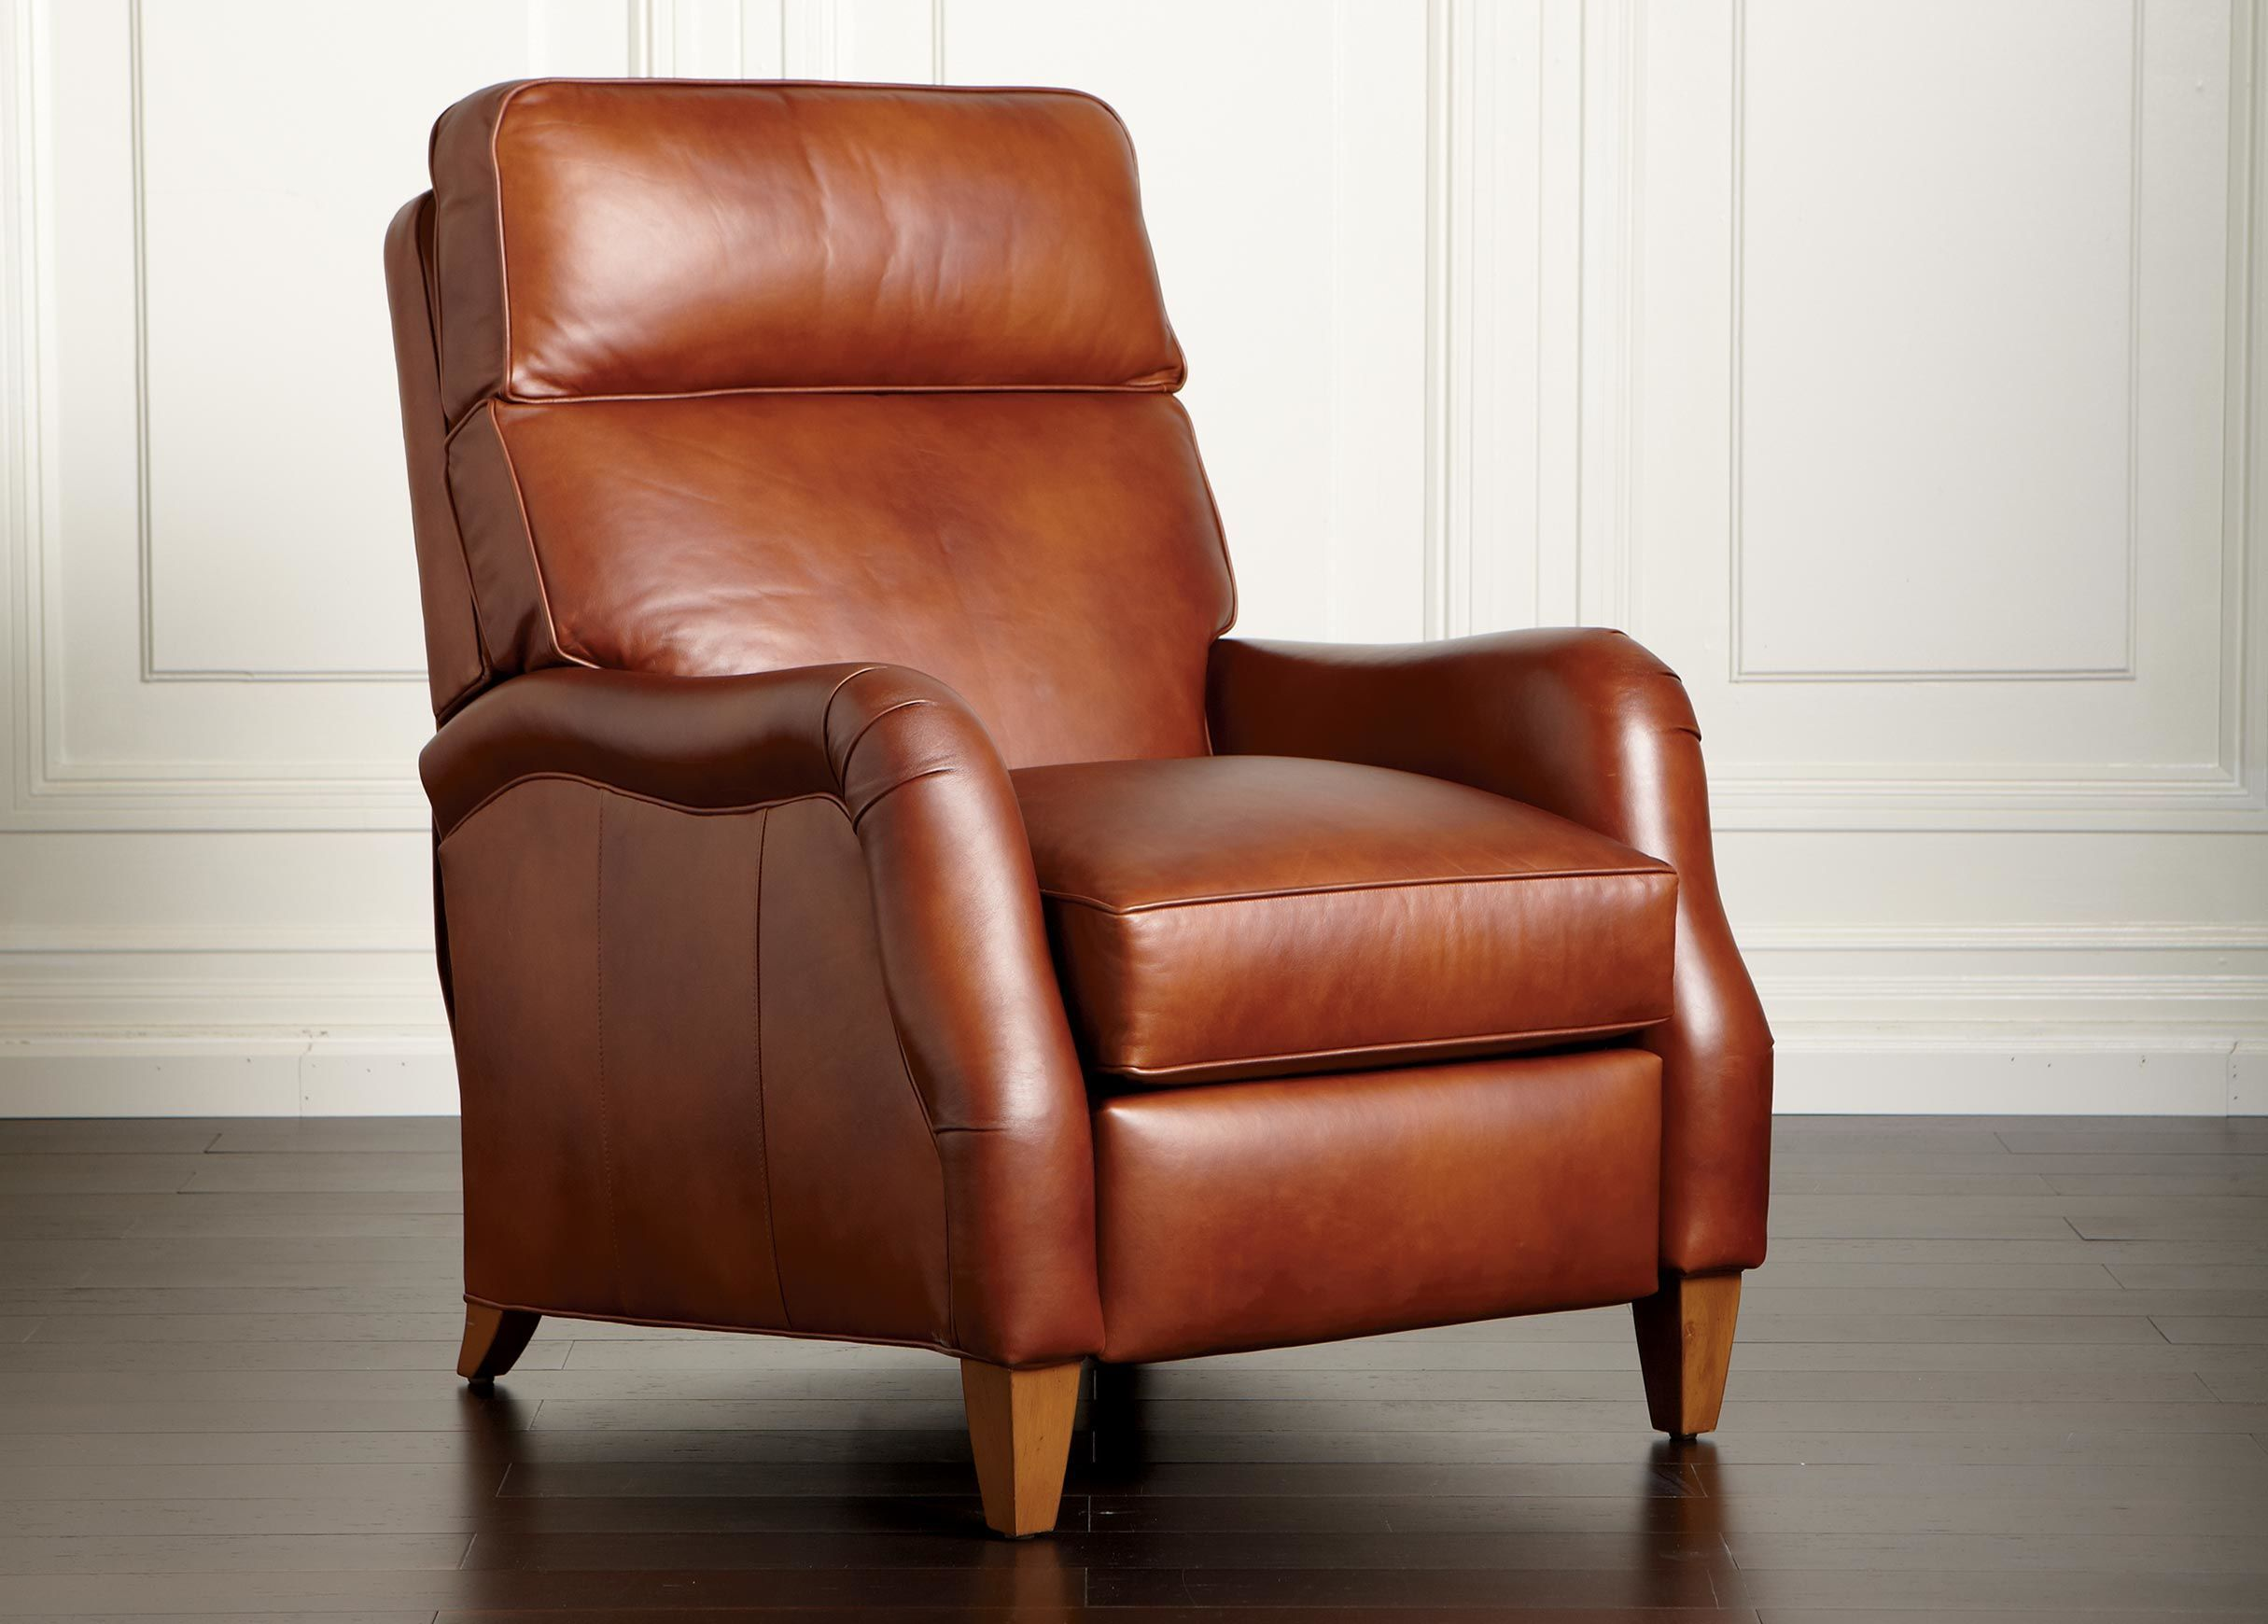 ethan allen recliners chairs mac sports folding chair aiden leather recliner pinterest